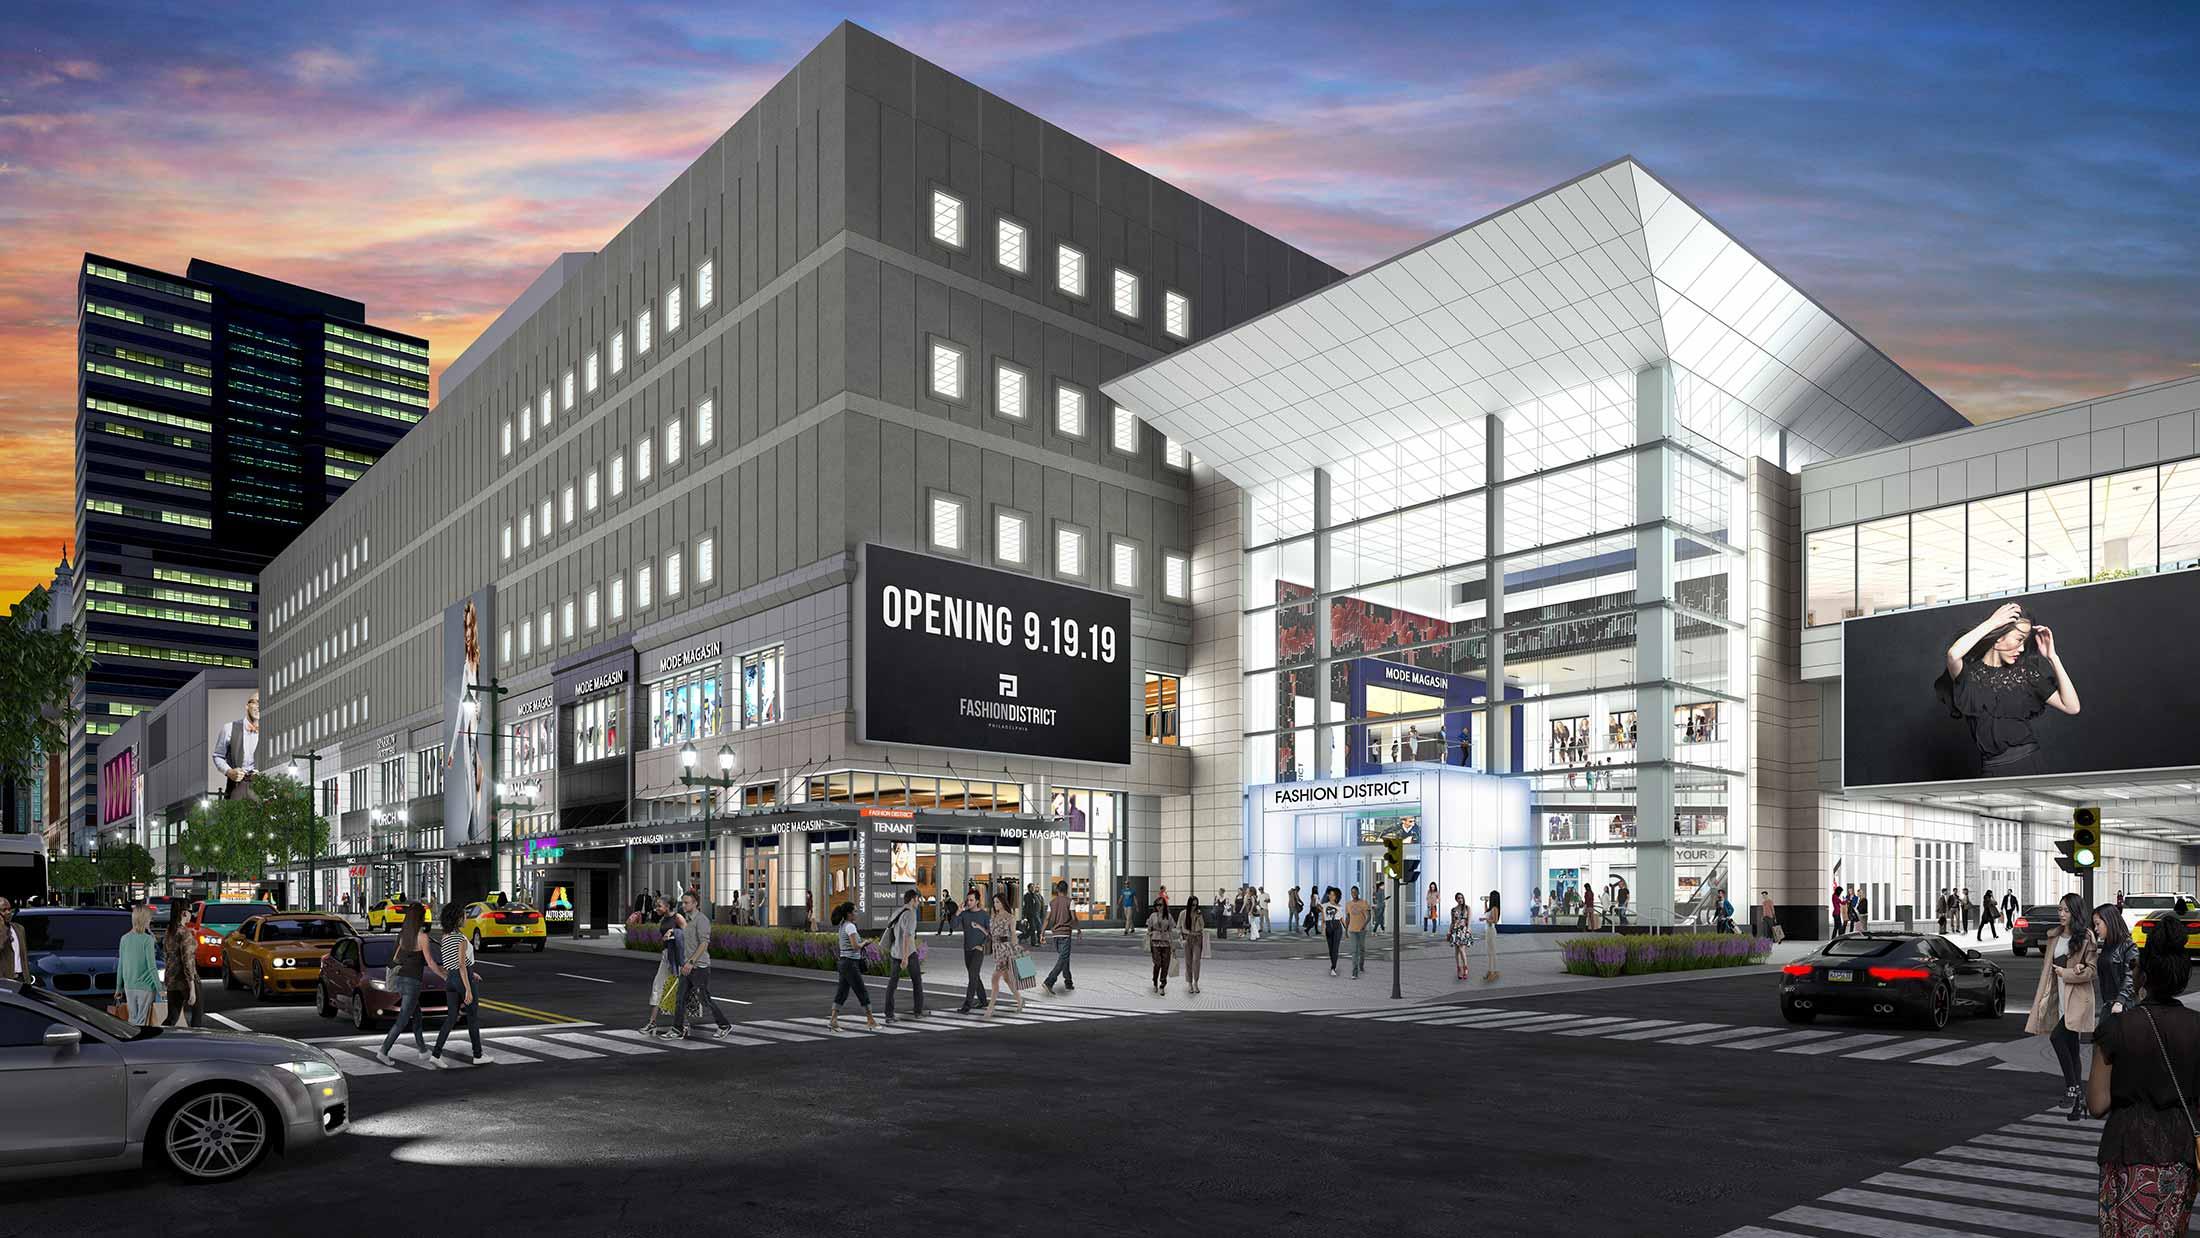 rendering of Fashion District Philadelphia exterior at night